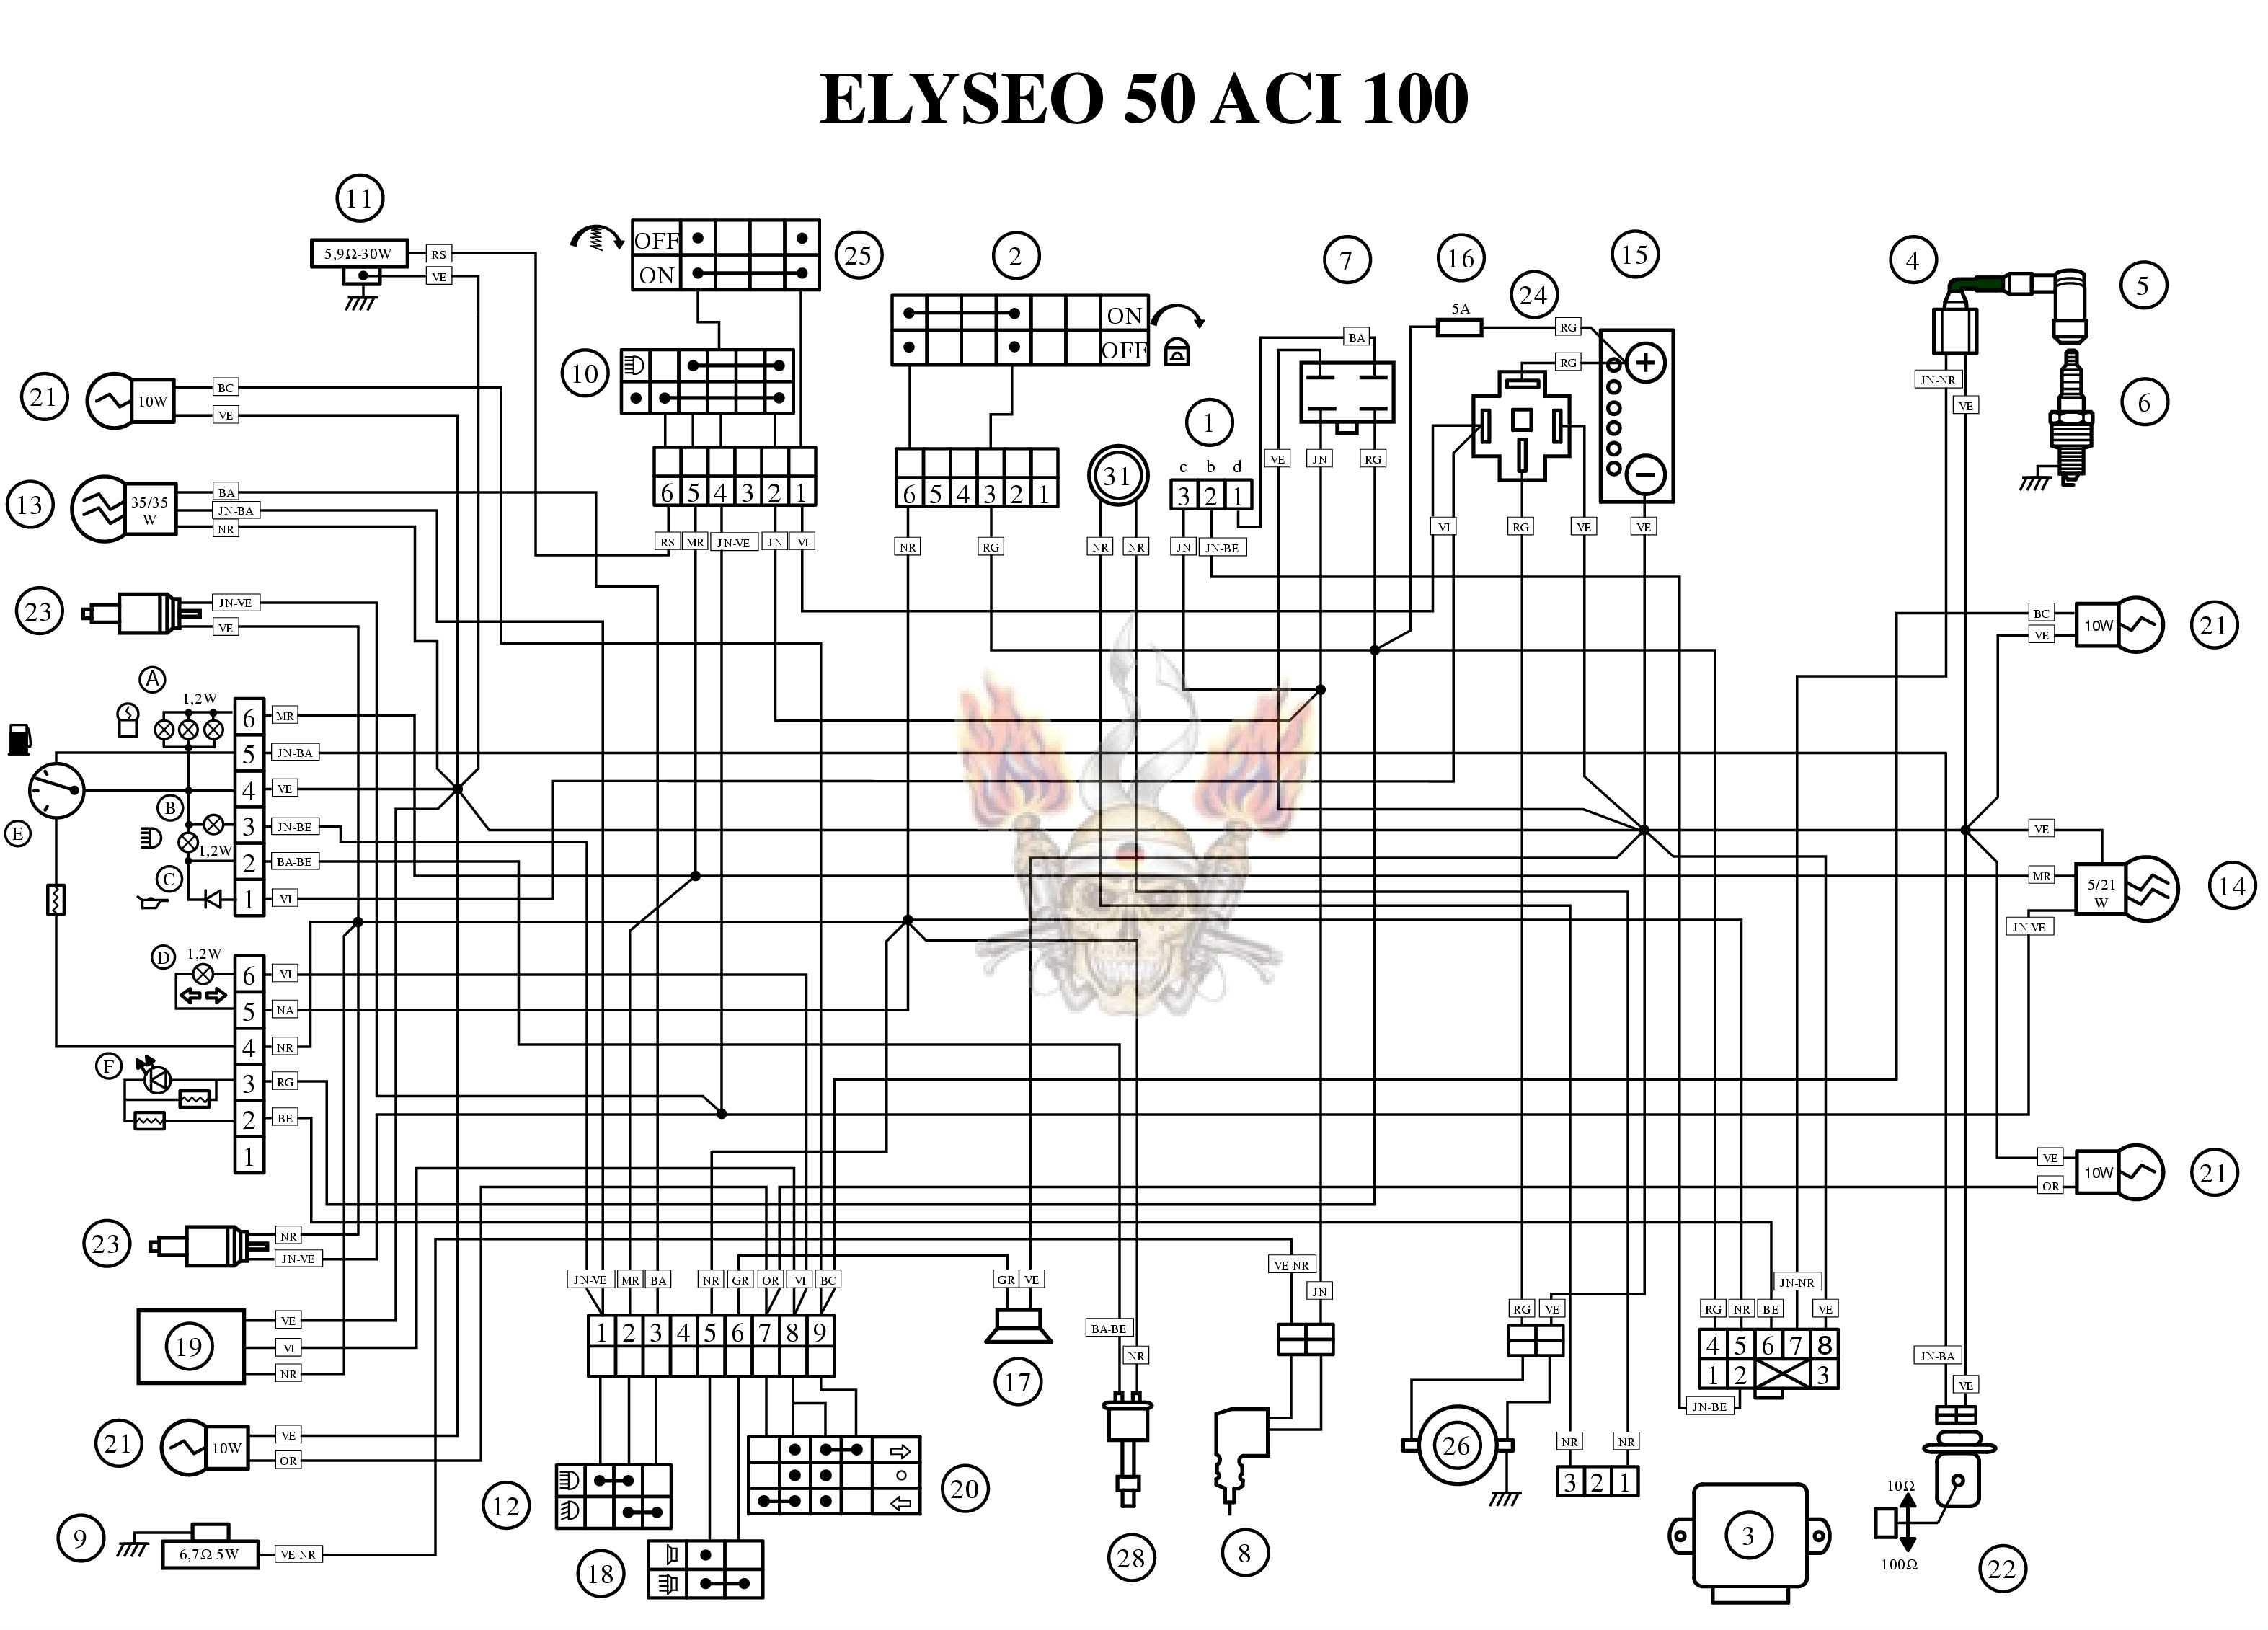 peugeot 807 wiring diagram free download peugeot 807 wiring diagram download efcaviation com [ 3146 x 2261 Pixel ]